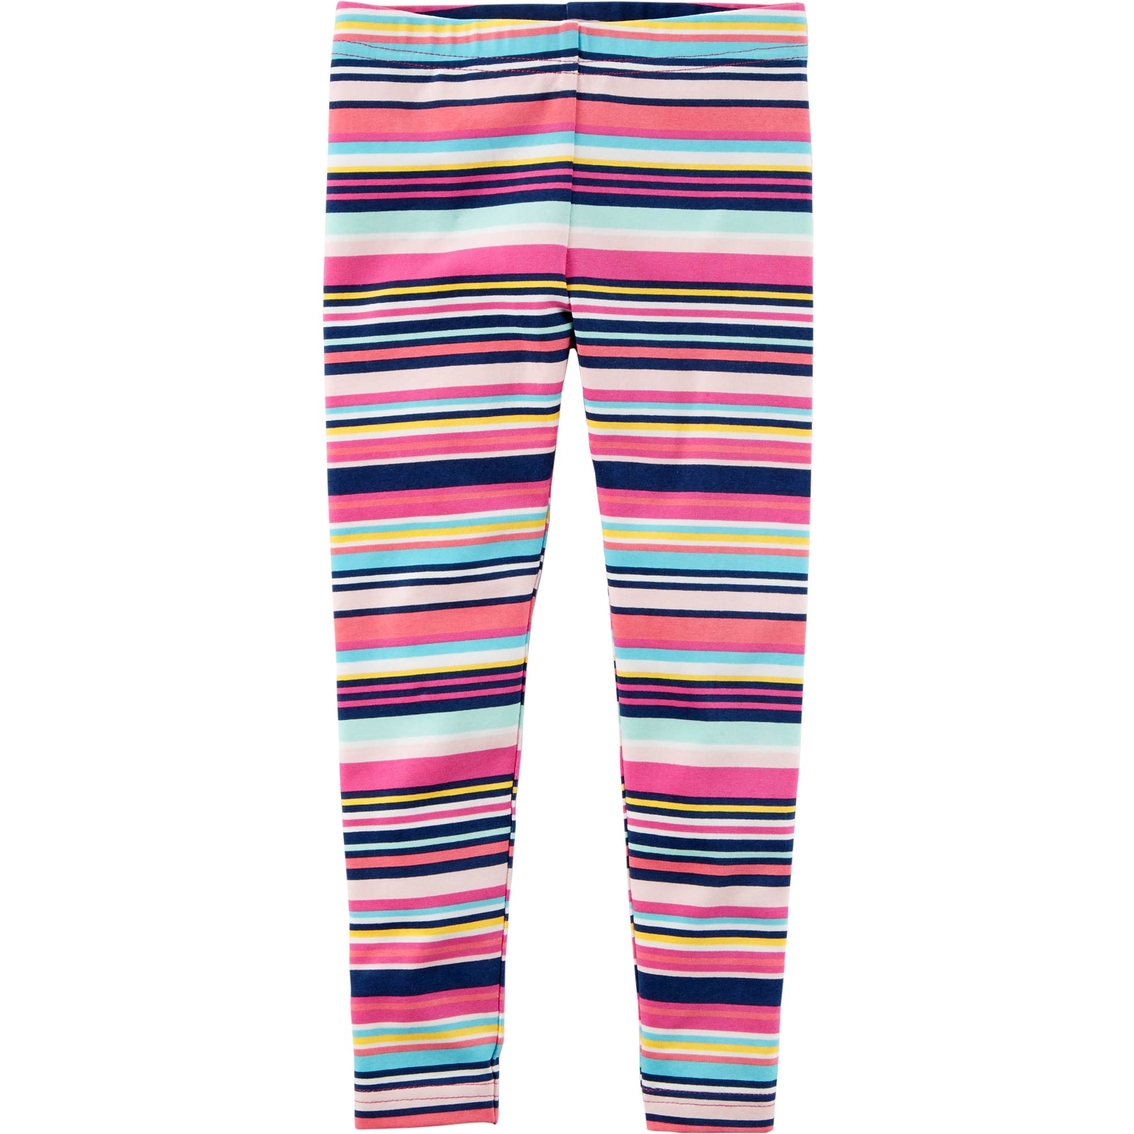 4304b84af3e4a Carter's Toddler Girls Striped Leggings | Toddler Girls 2t-4t ...